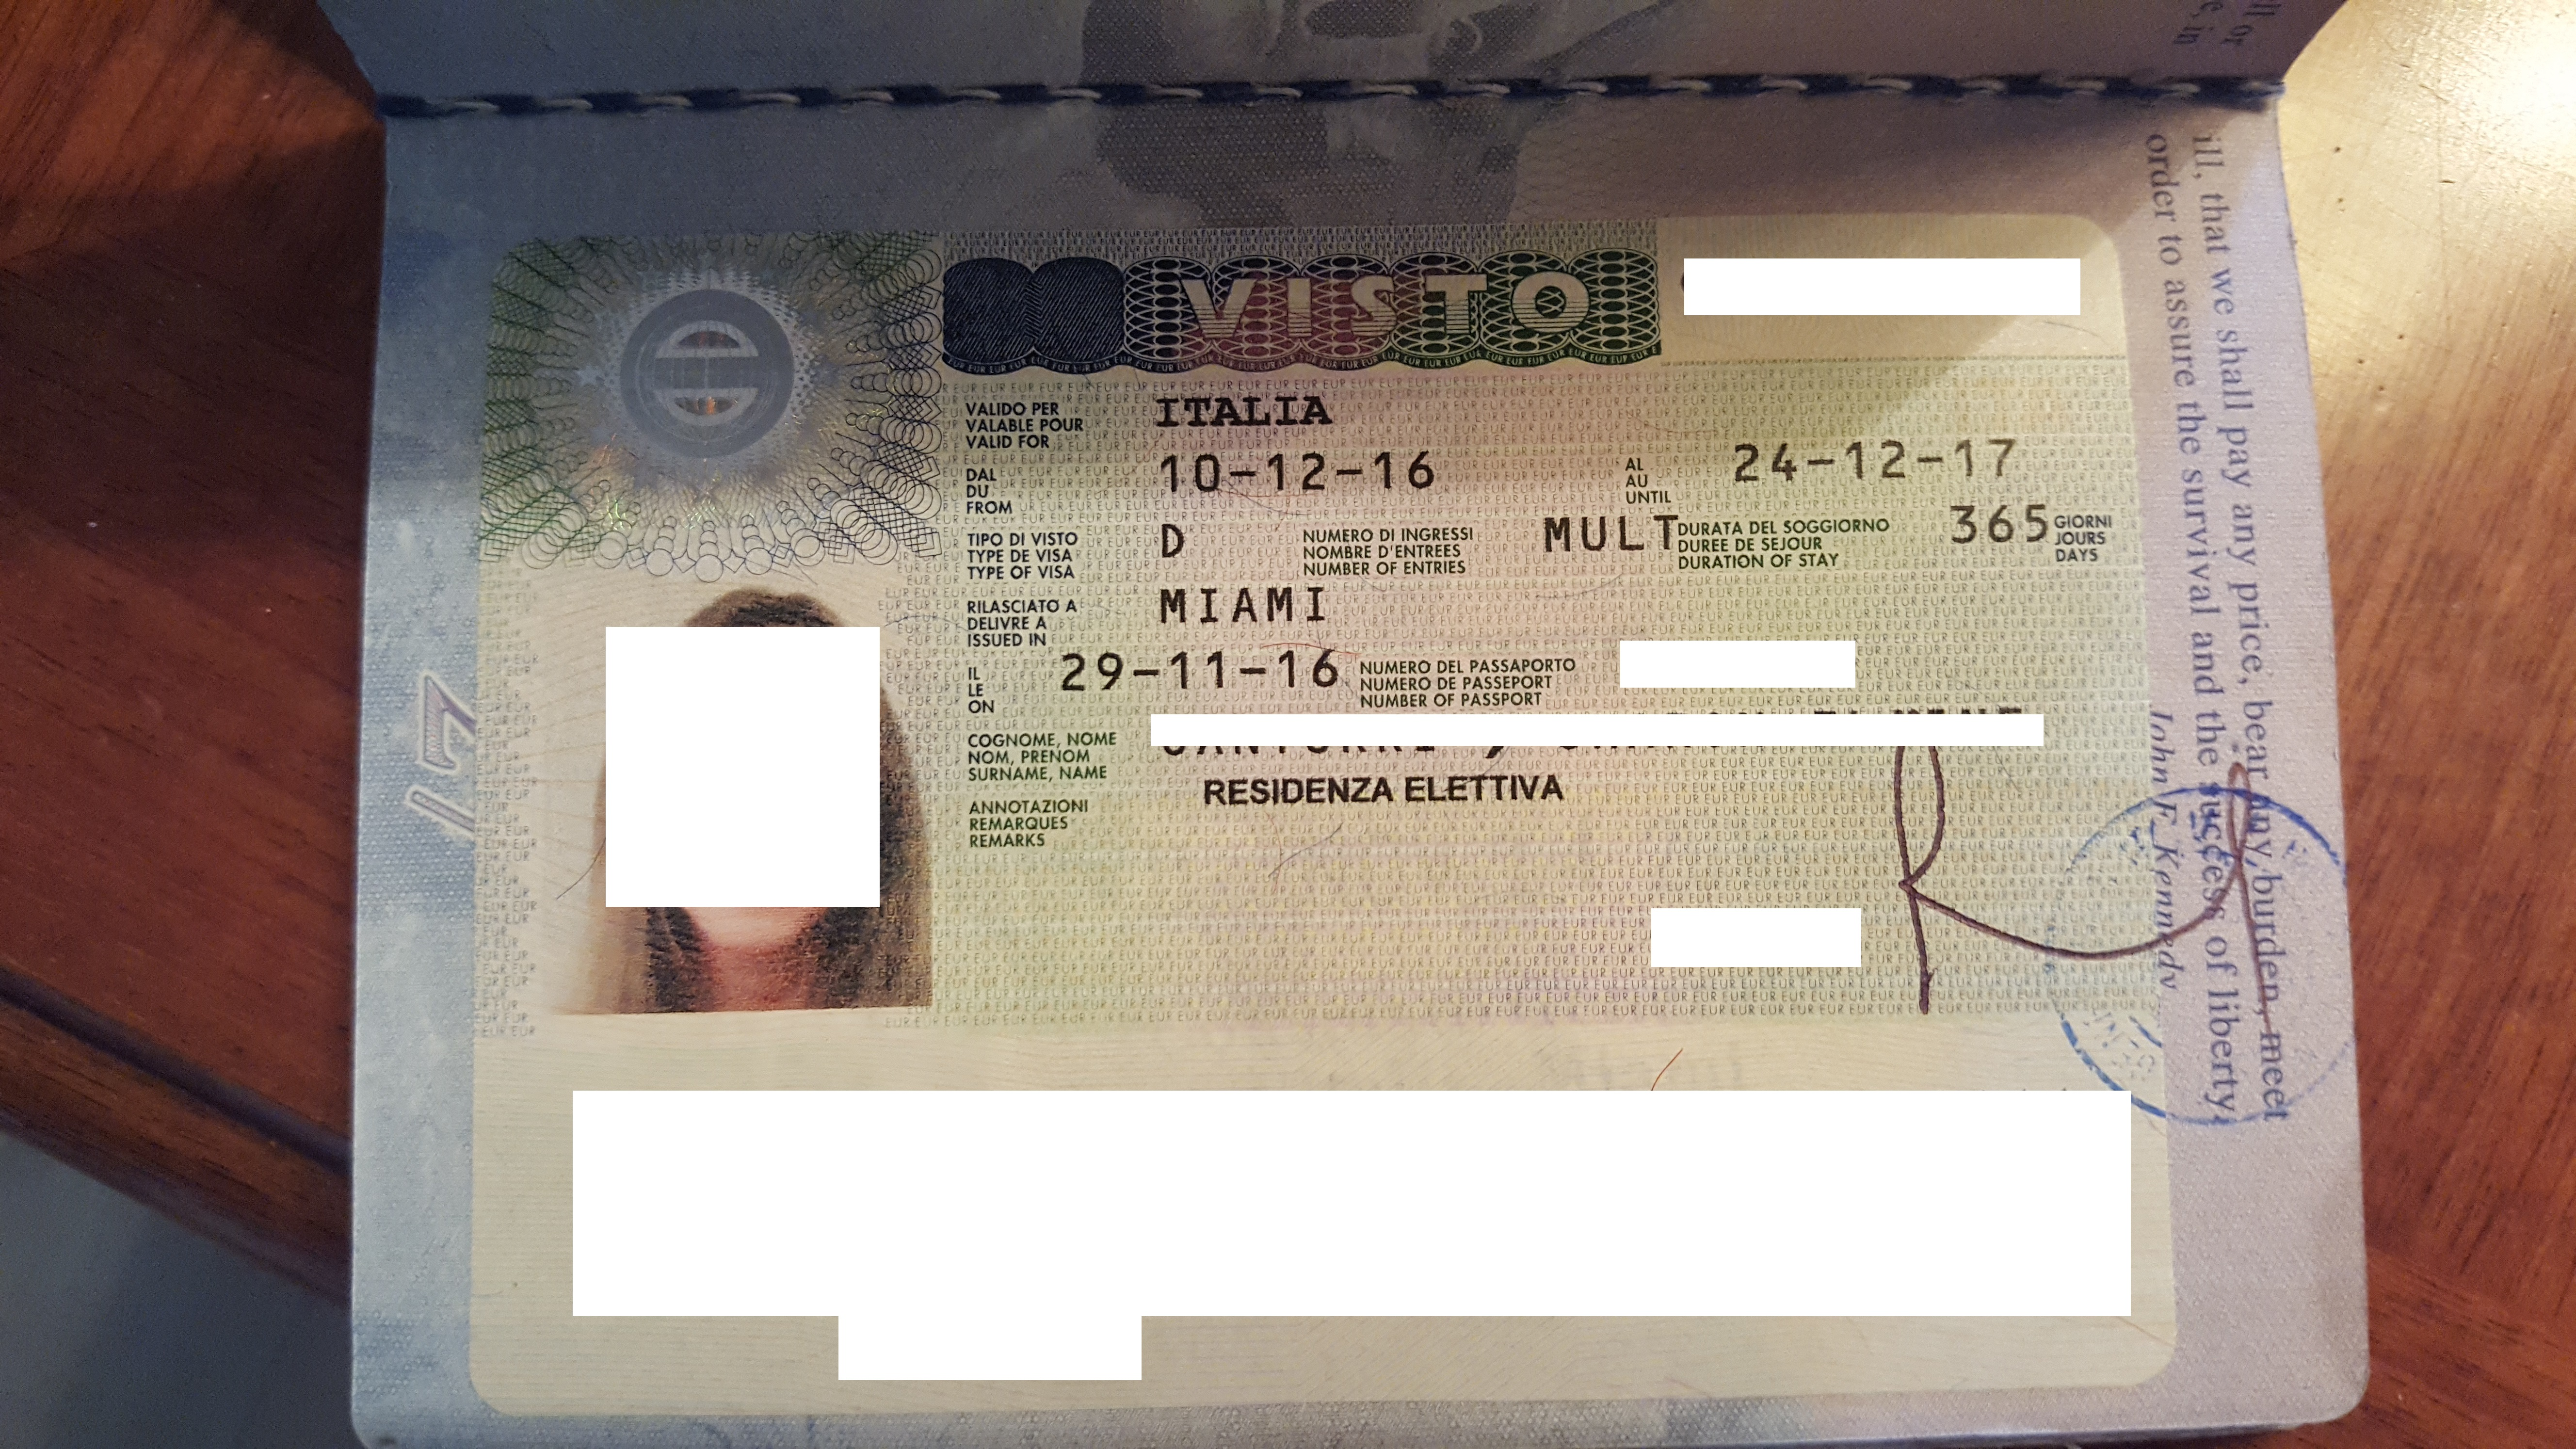 Italian Elective Residence Visa Application - Studio Legale Metta